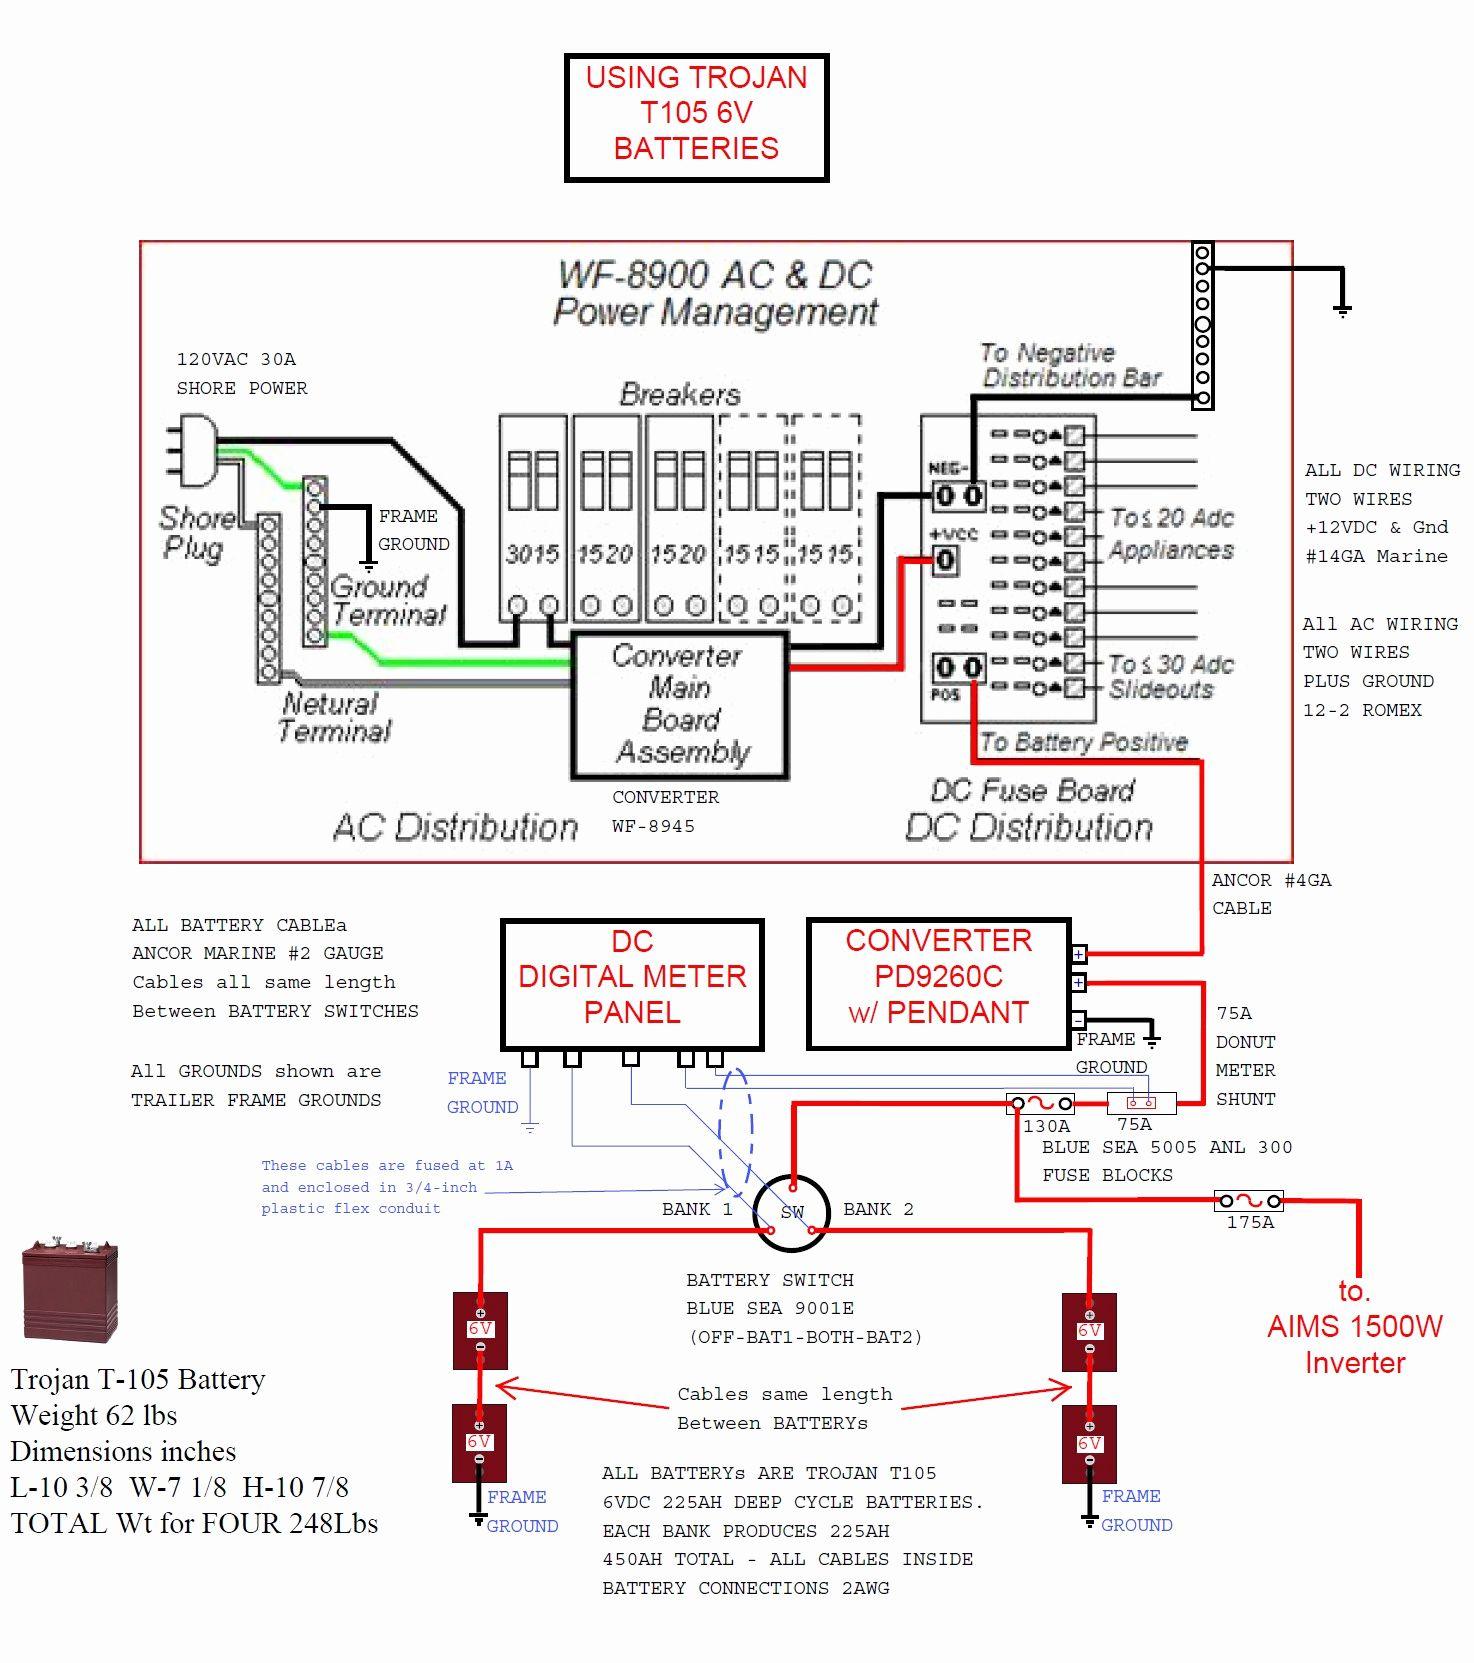 Wfco 55 Amp Power Converter Wiring Diagram | Wiring Diagram - Wfco 8955 Wiring Diagram